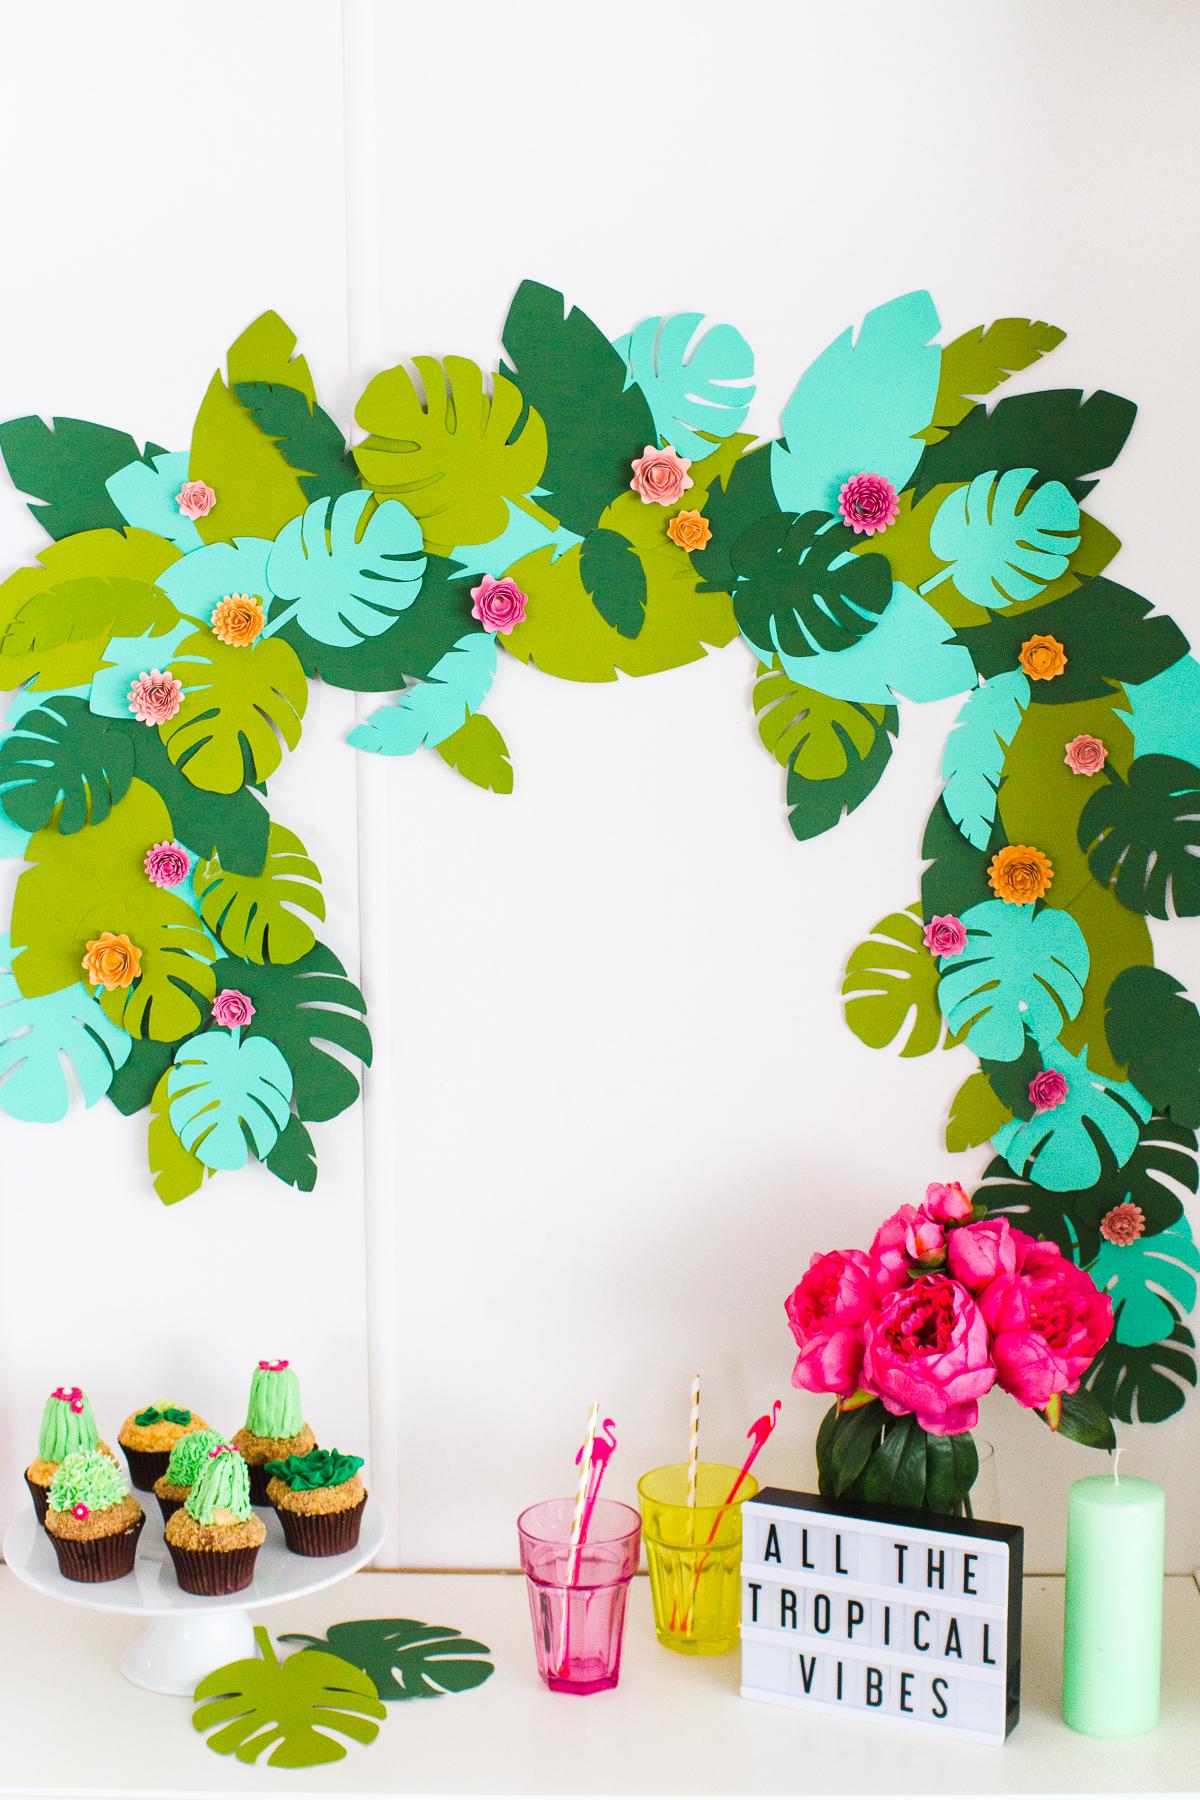 Diy Tropical Garland Studio Diy Find images of tropical leaves. diy tropical garland studio diy